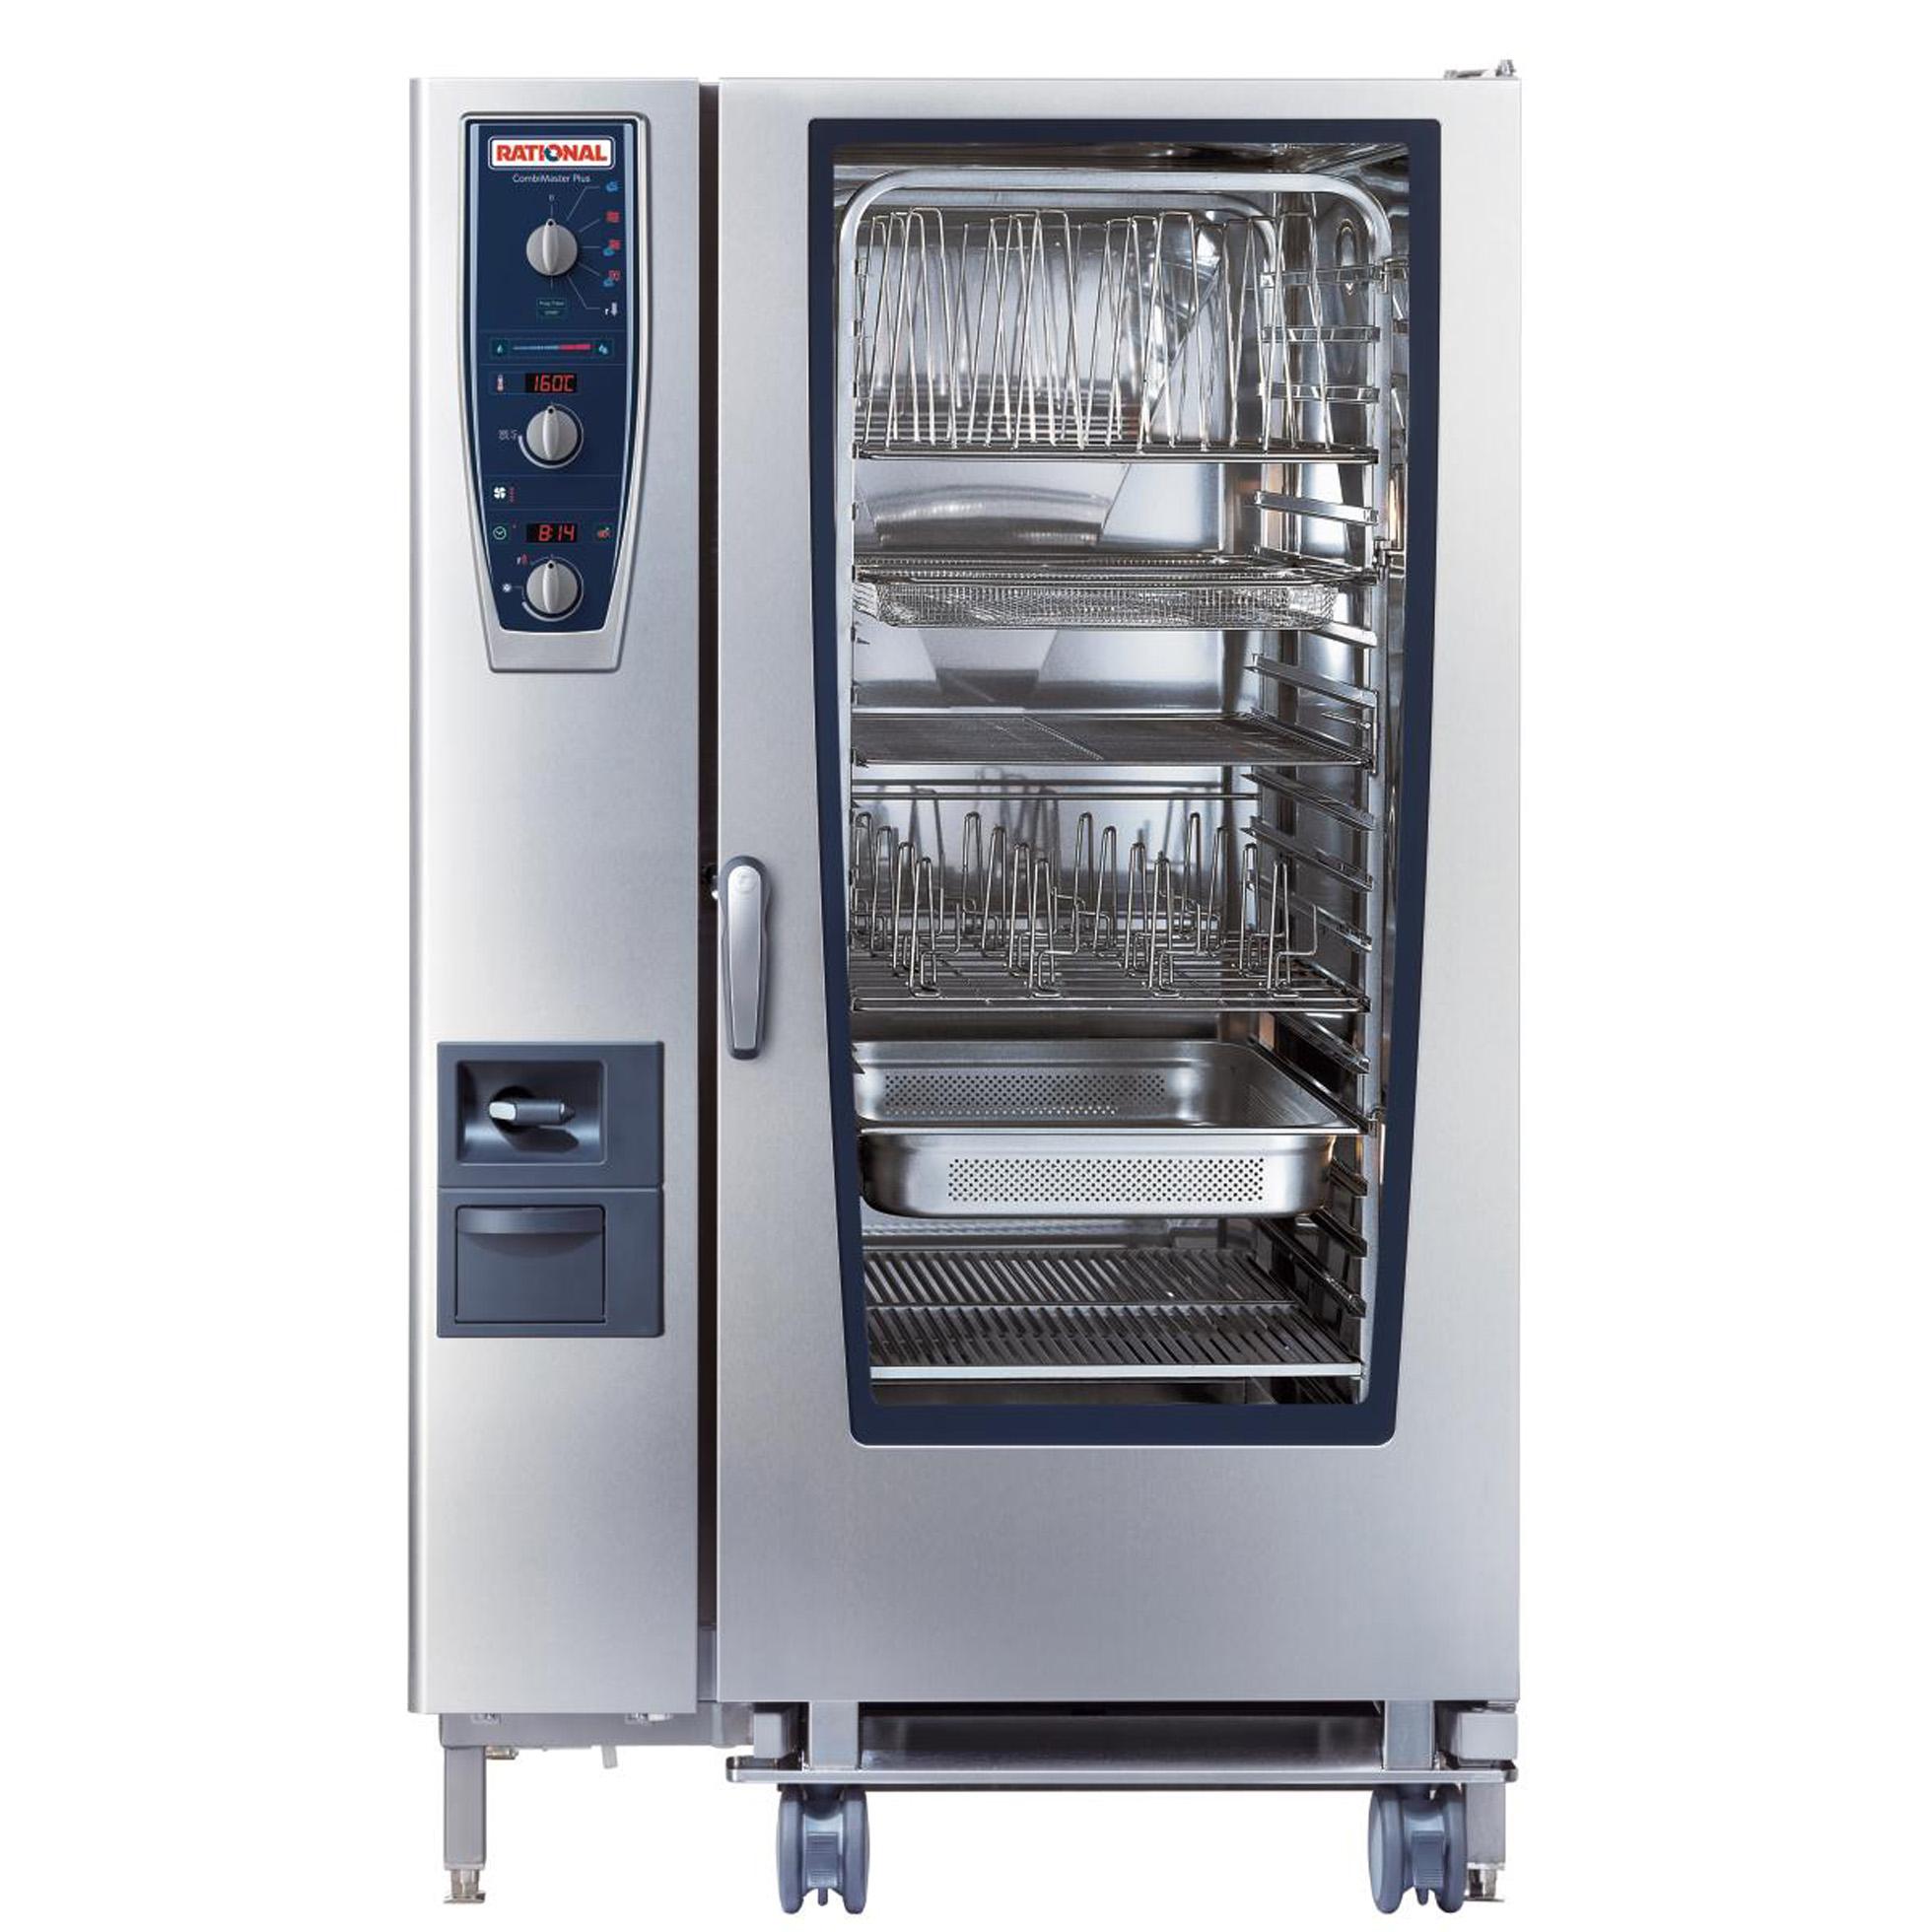 RATIONAL B229206.19D202 combi oven, gas